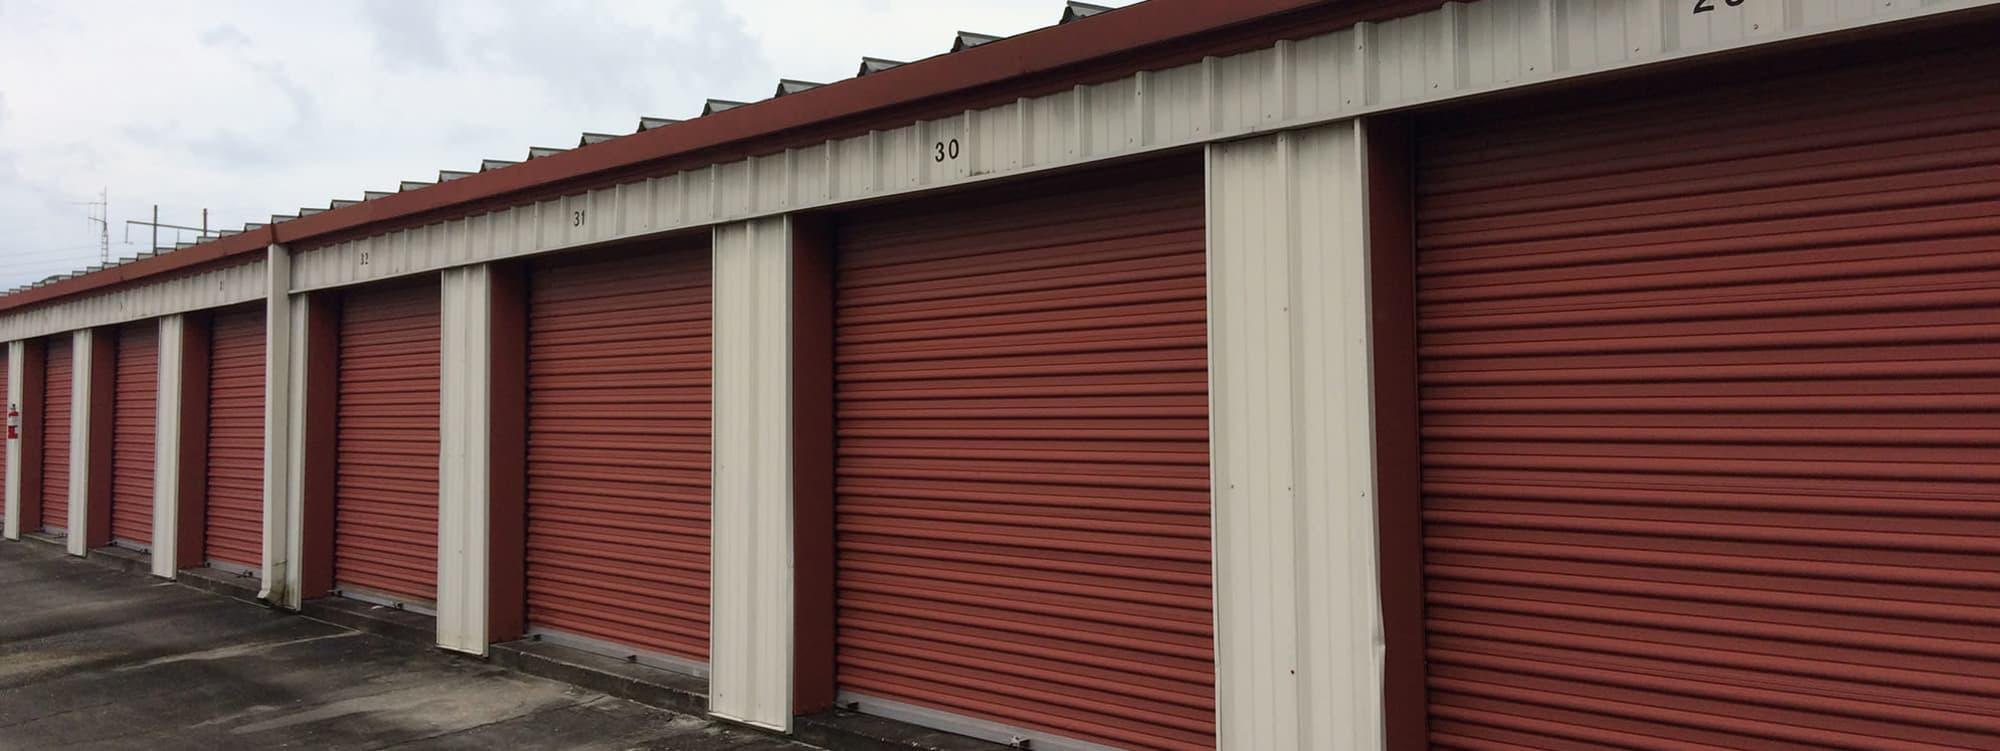 Self storage in Panama City FL